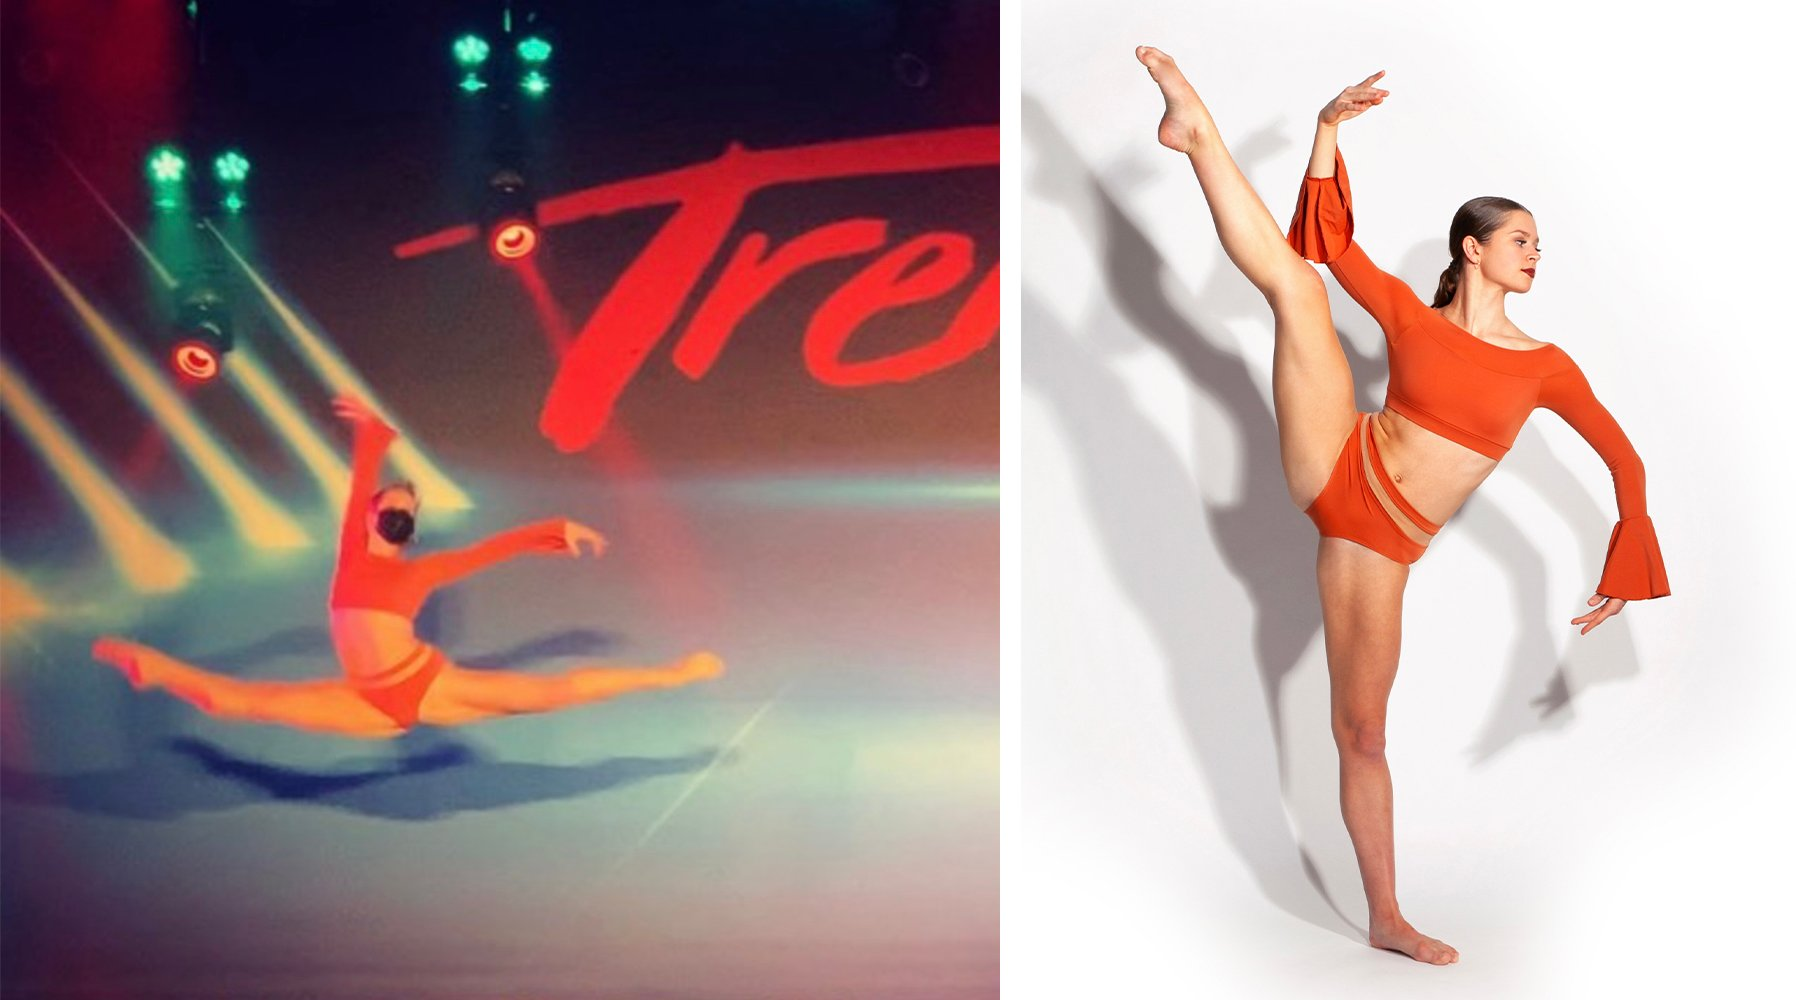 Tremaine Dancer of the Year Emy Urdahl